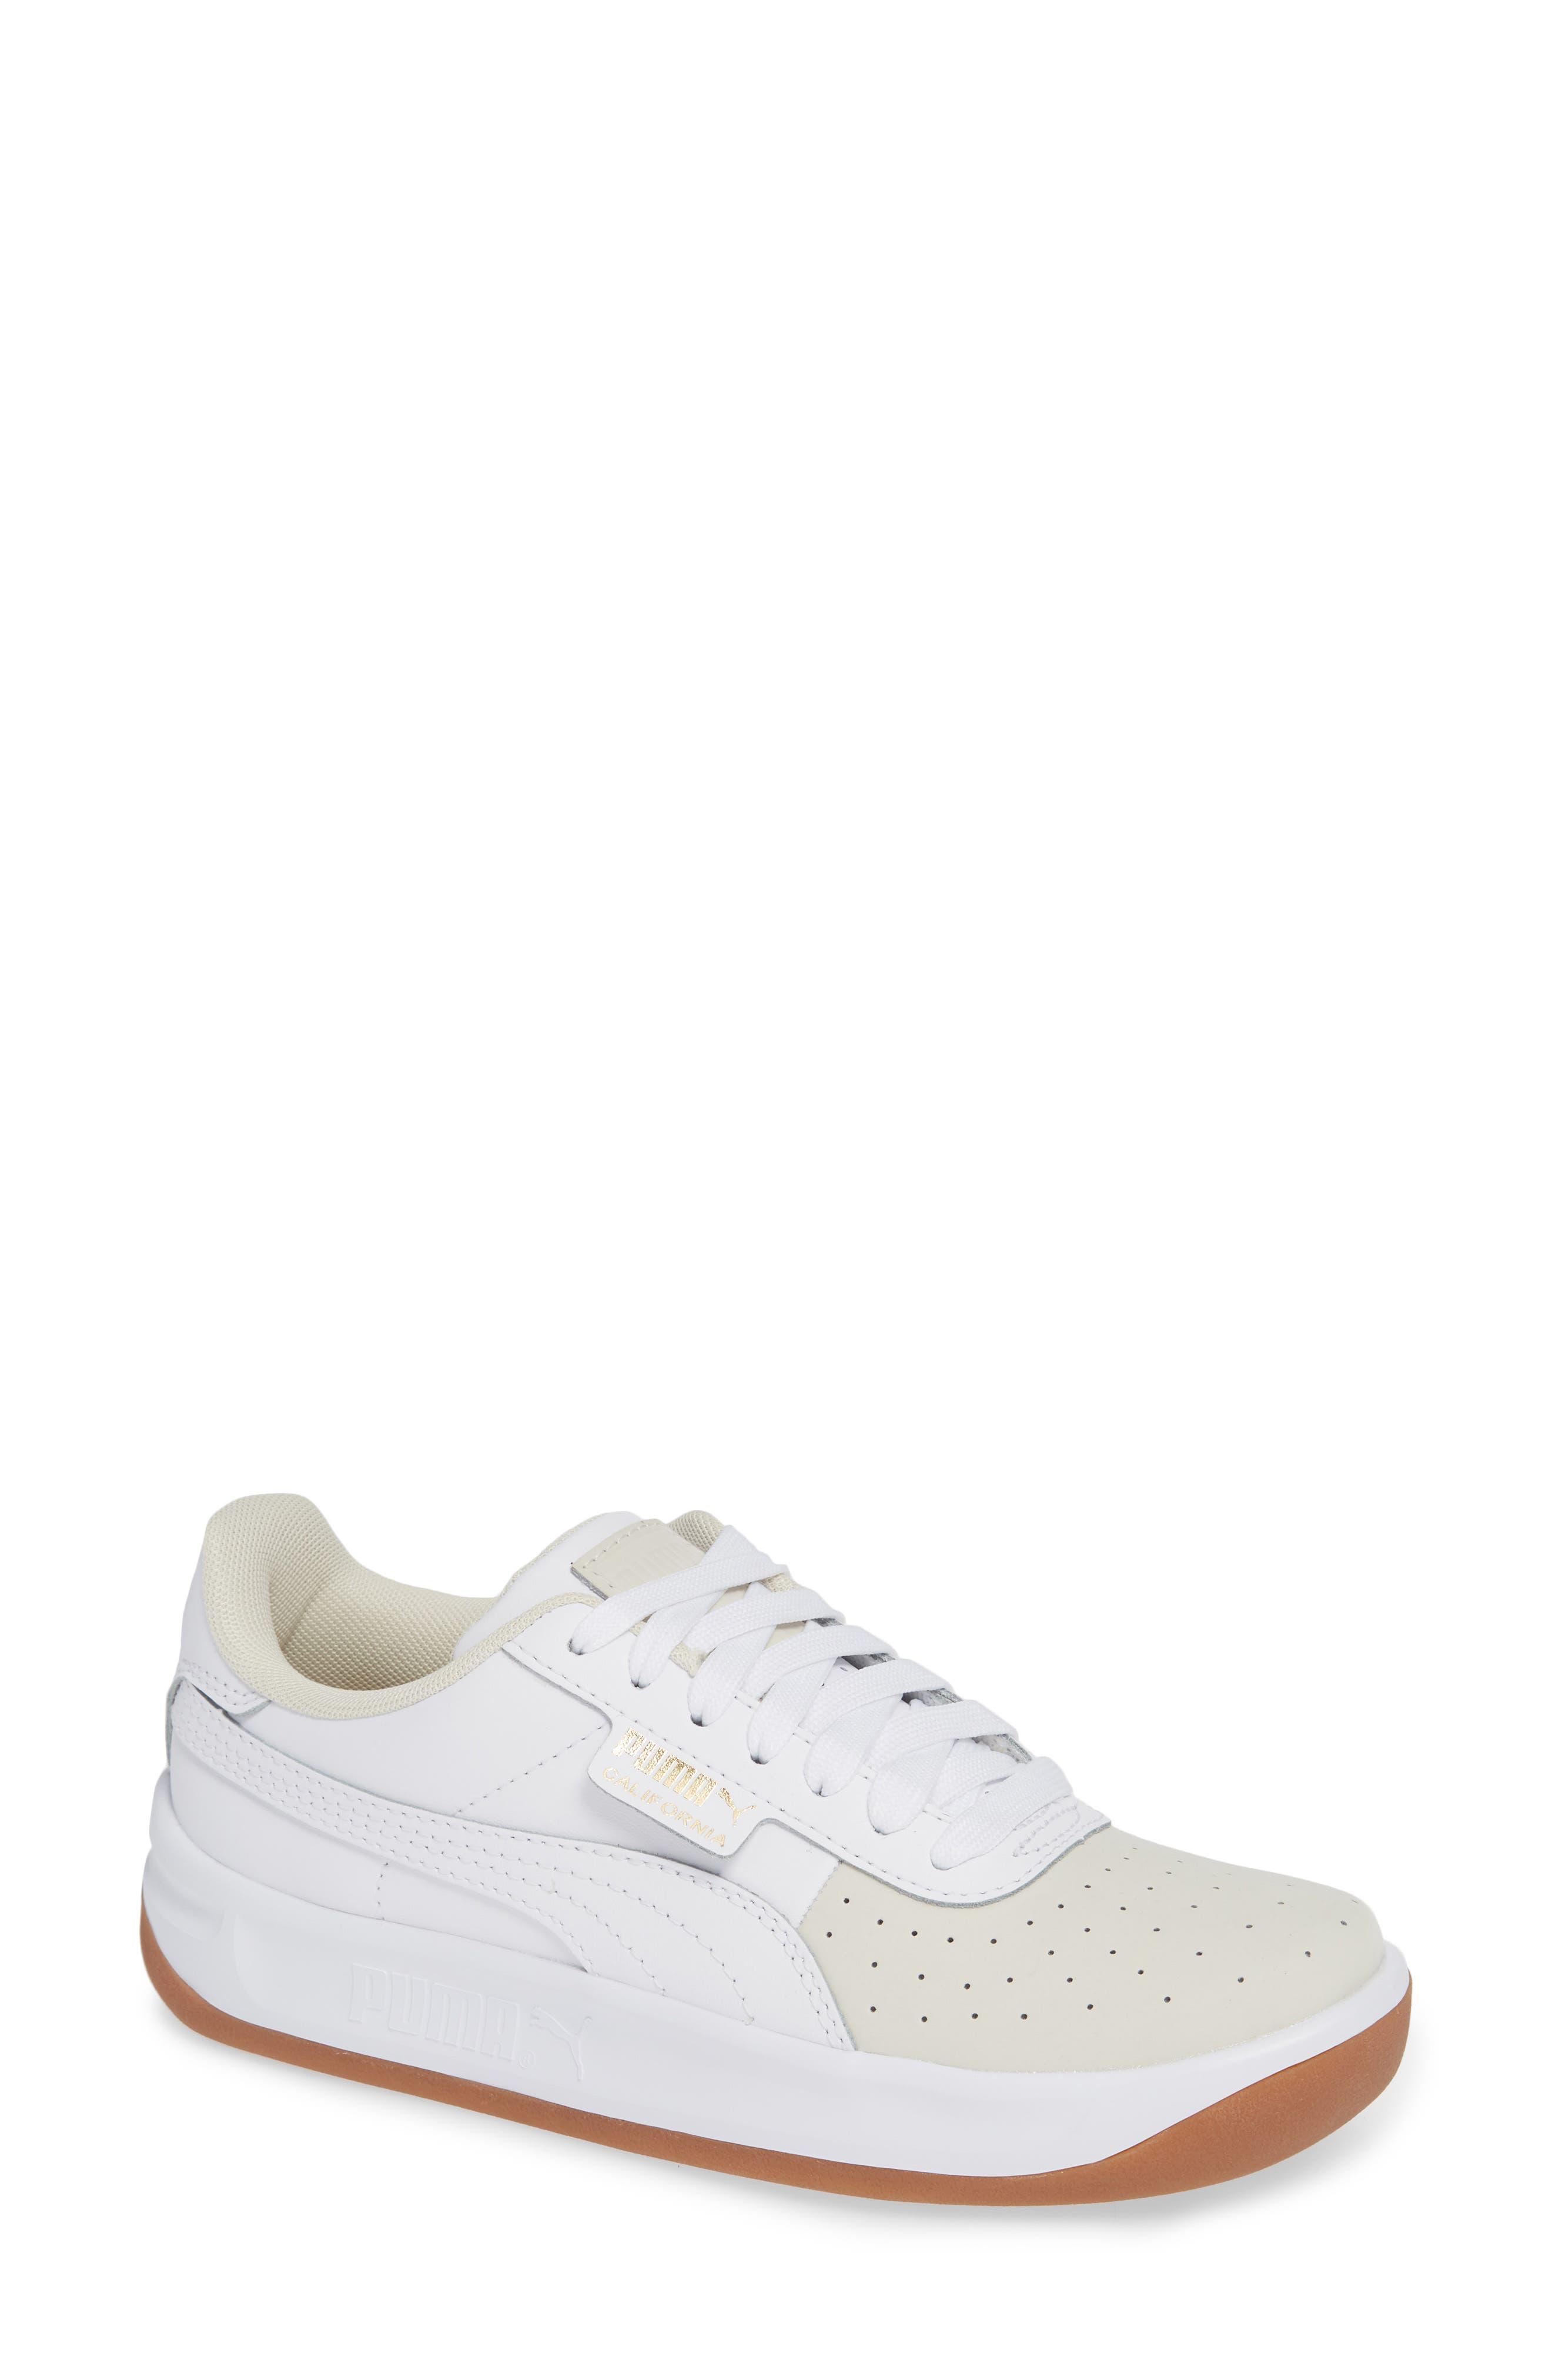 California Exotic Sneaker,                             Main thumbnail 1, color,                             100